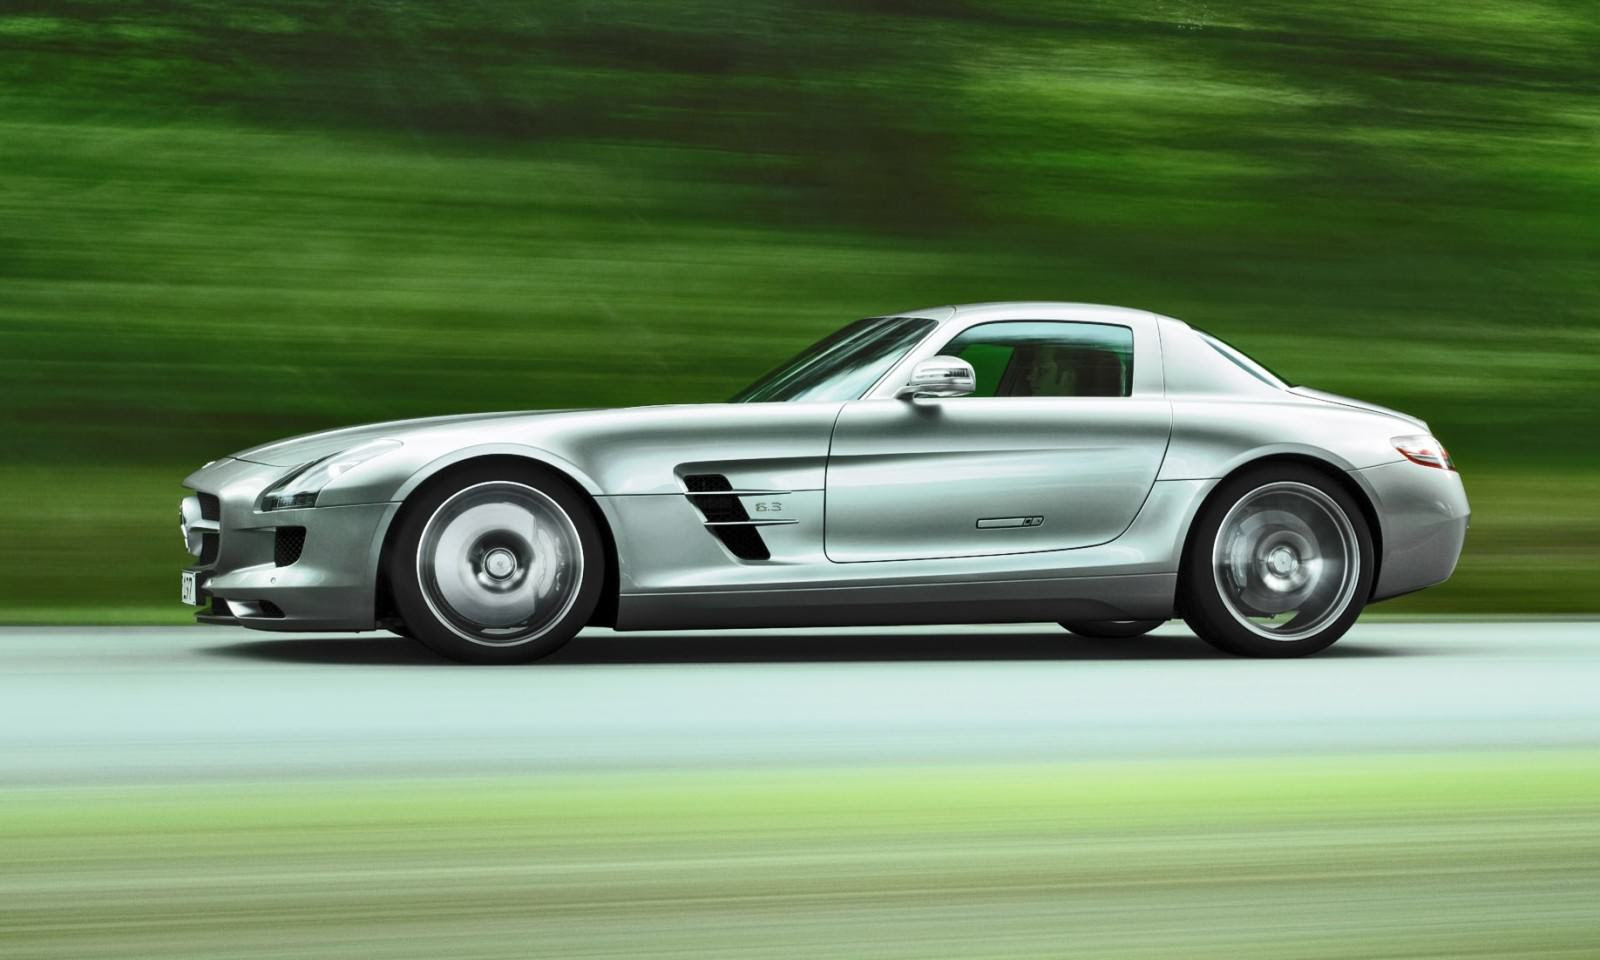 Mercedes-Benz Gullwing Supercar Evolution 59 copy